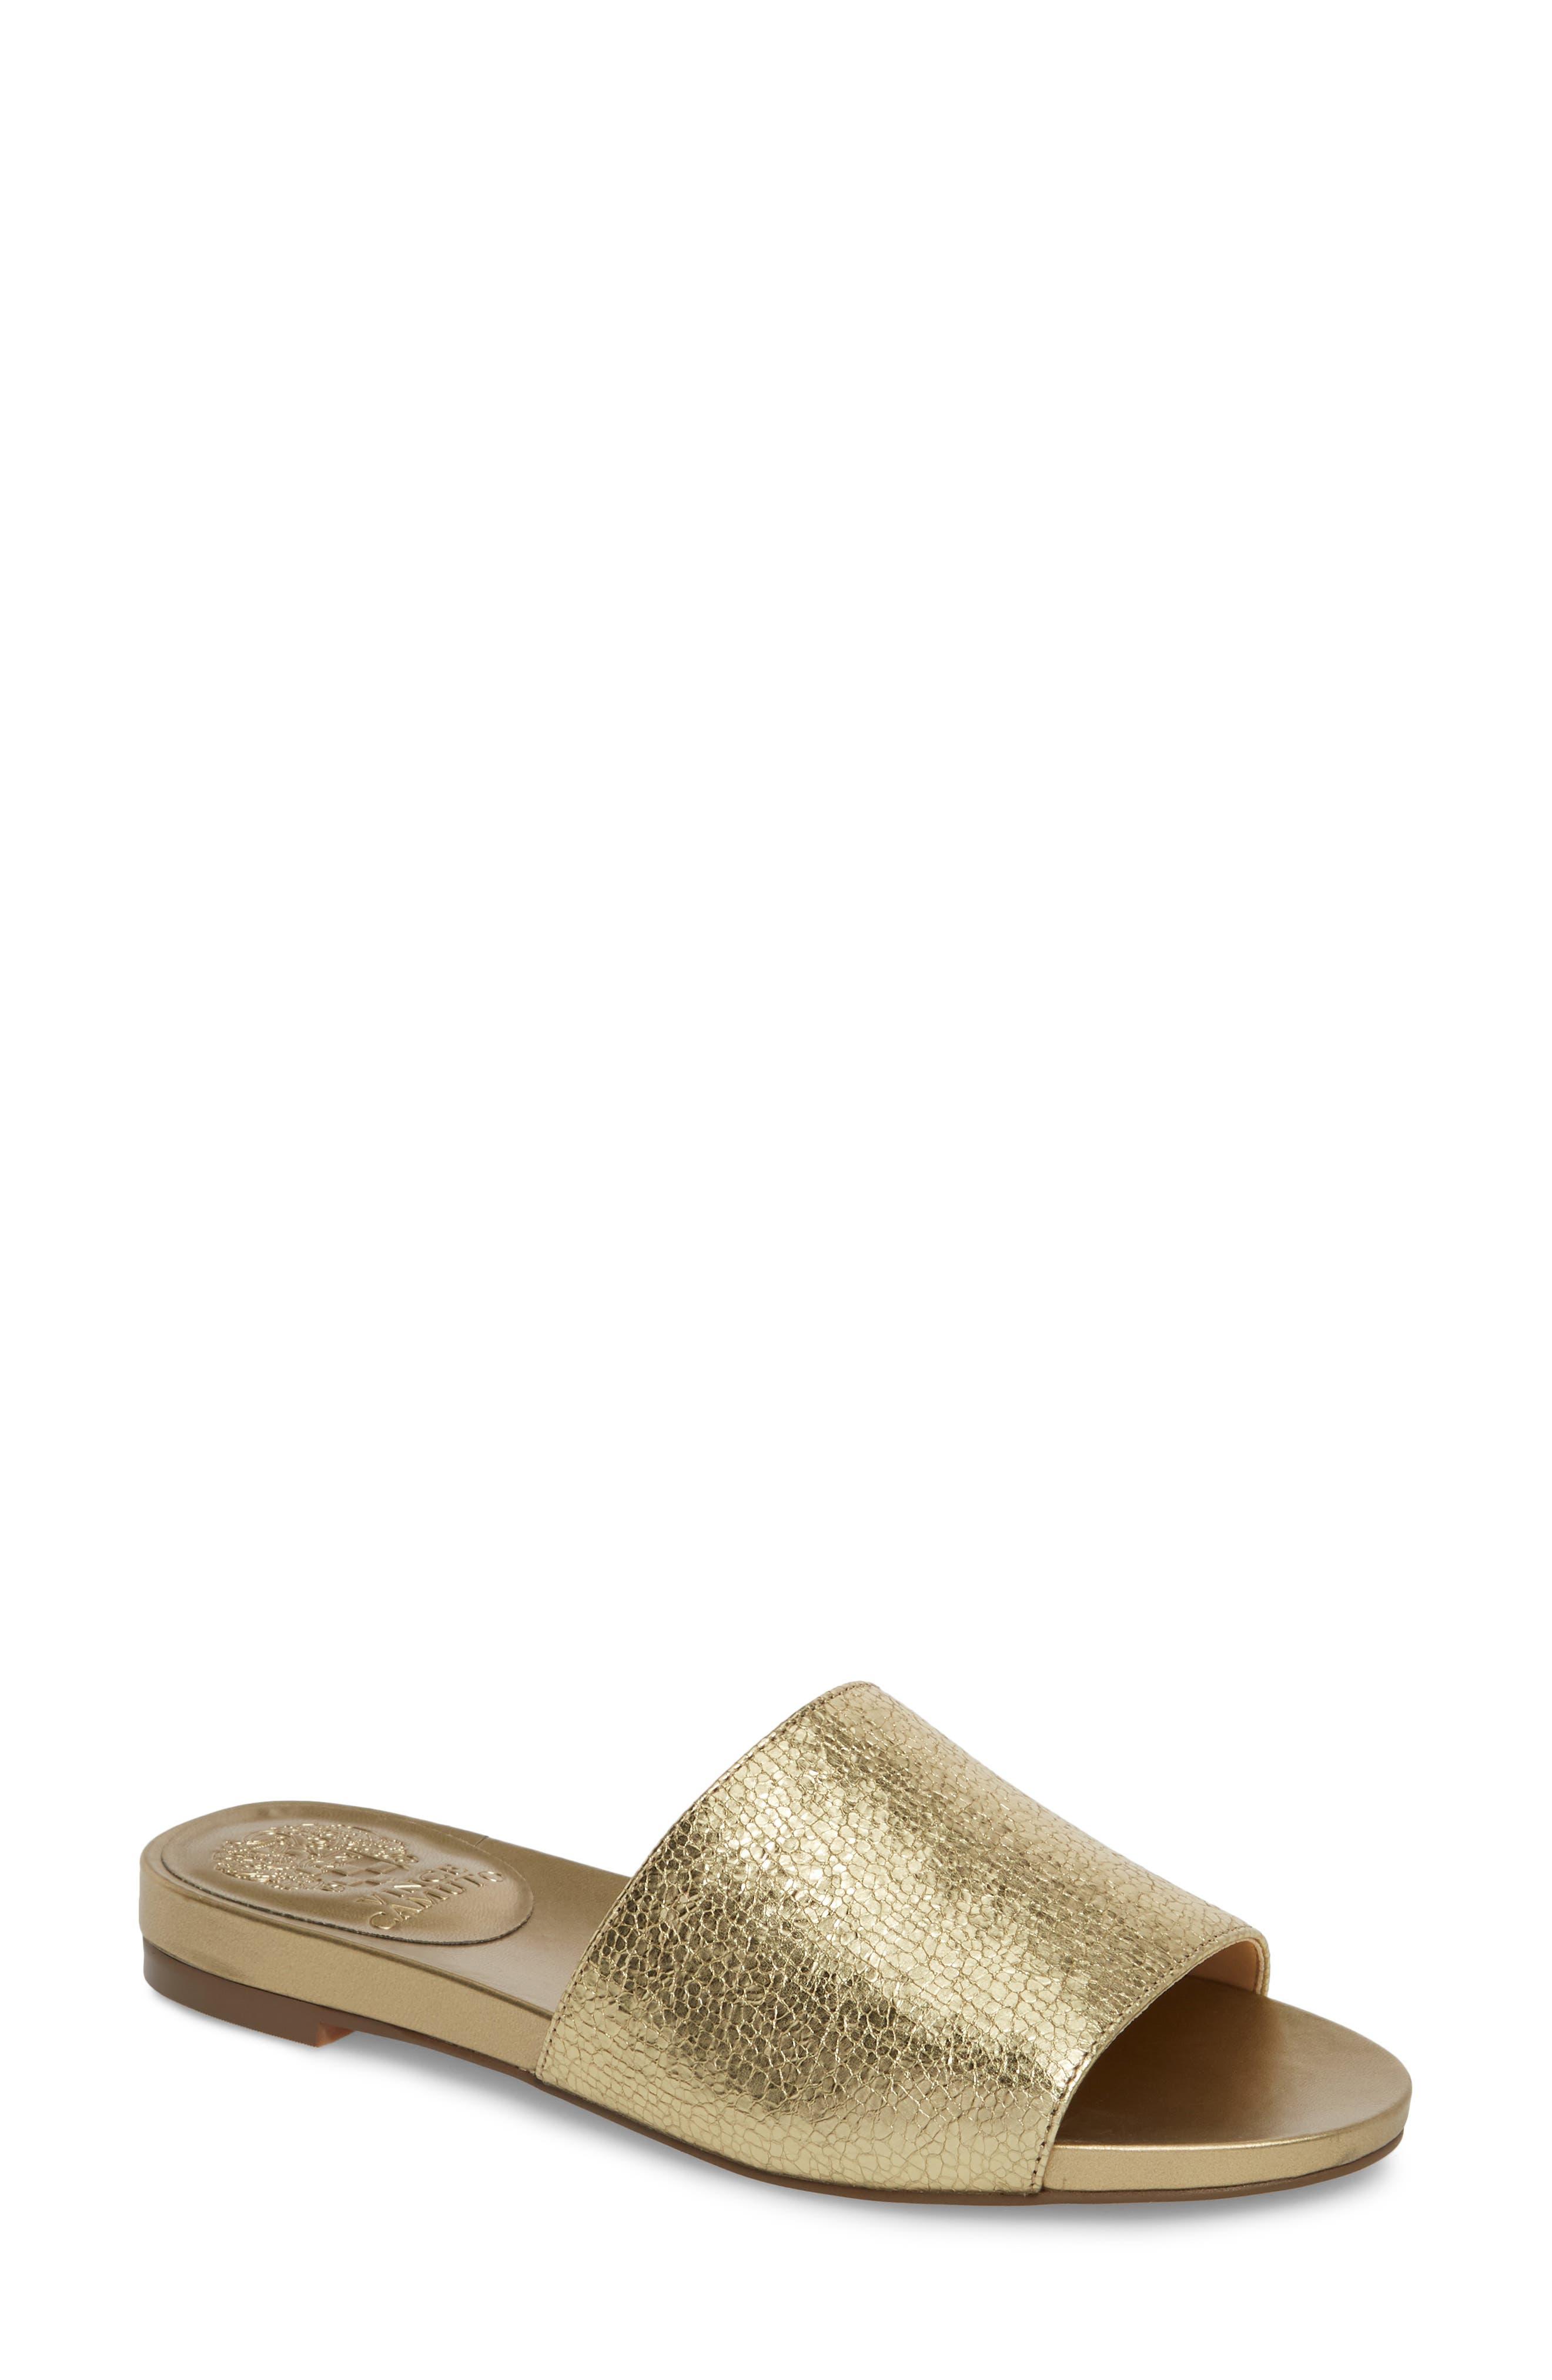 Haydan Slide Sandal,                             Main thumbnail 1, color,                             Karat Gold Fabric